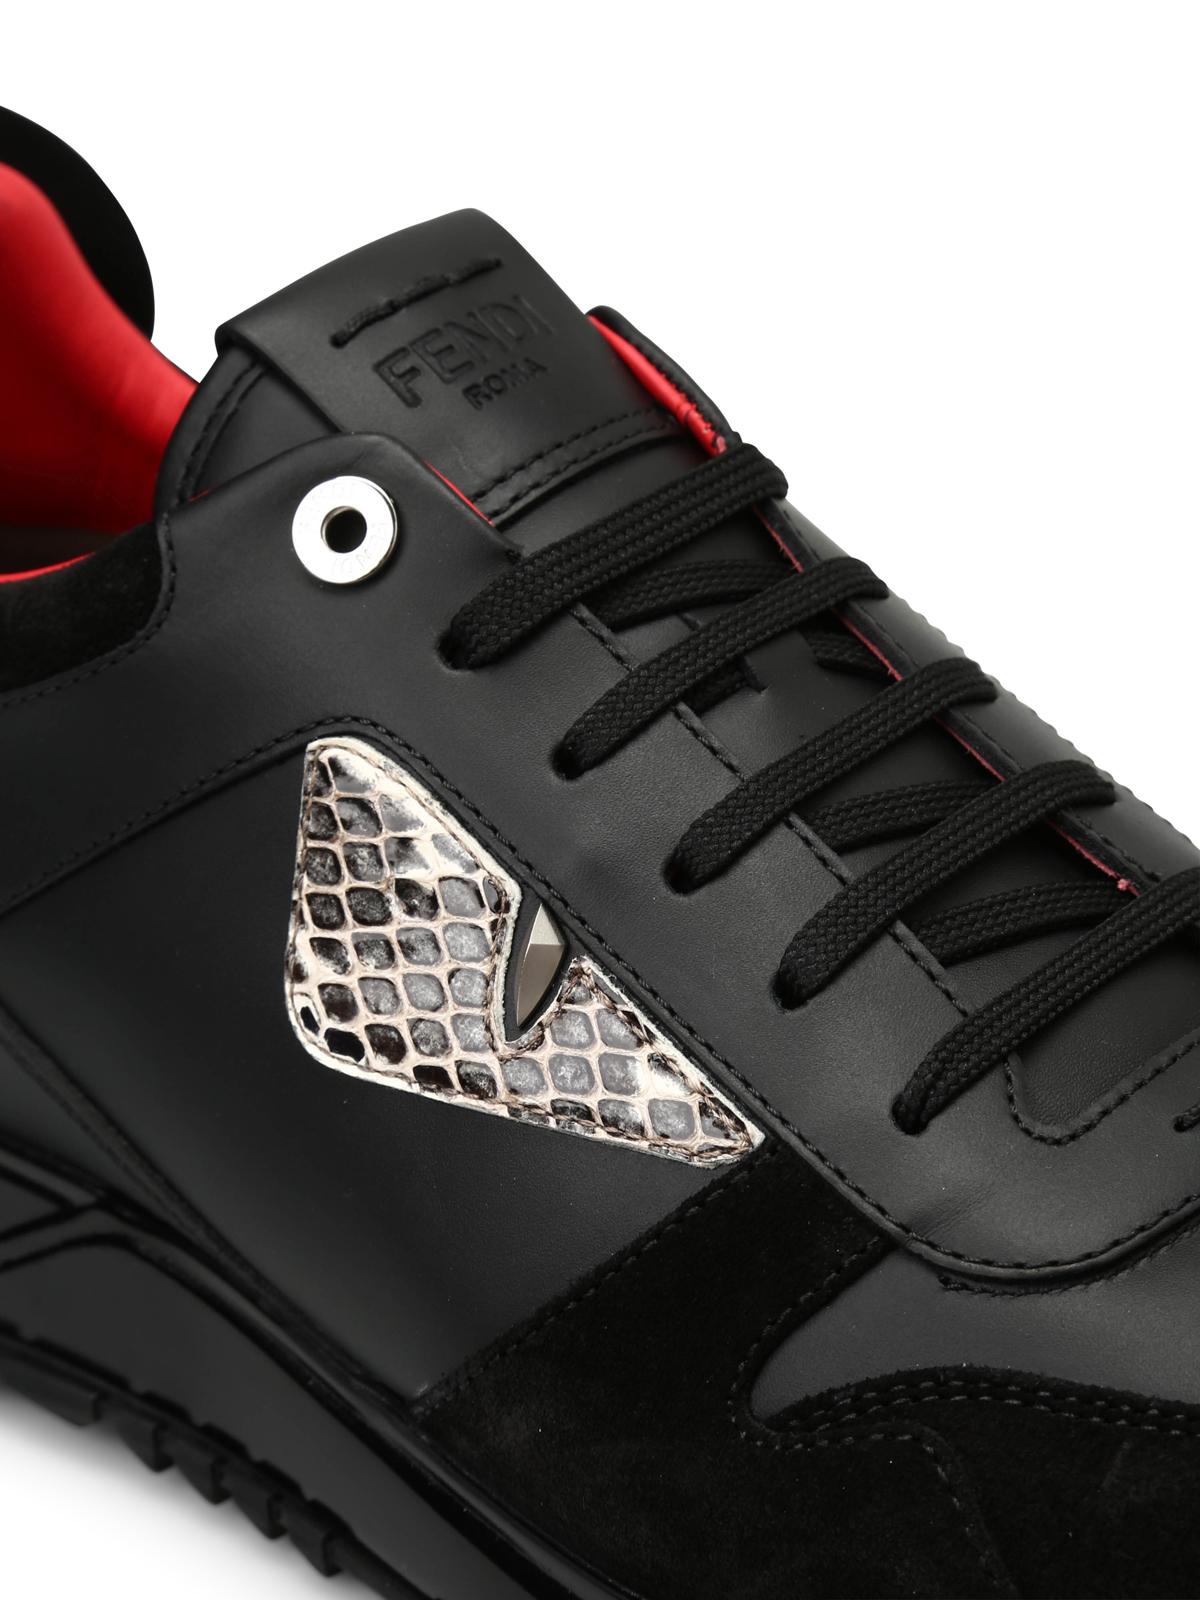 Fendi - Bag Bugs leather sneakers